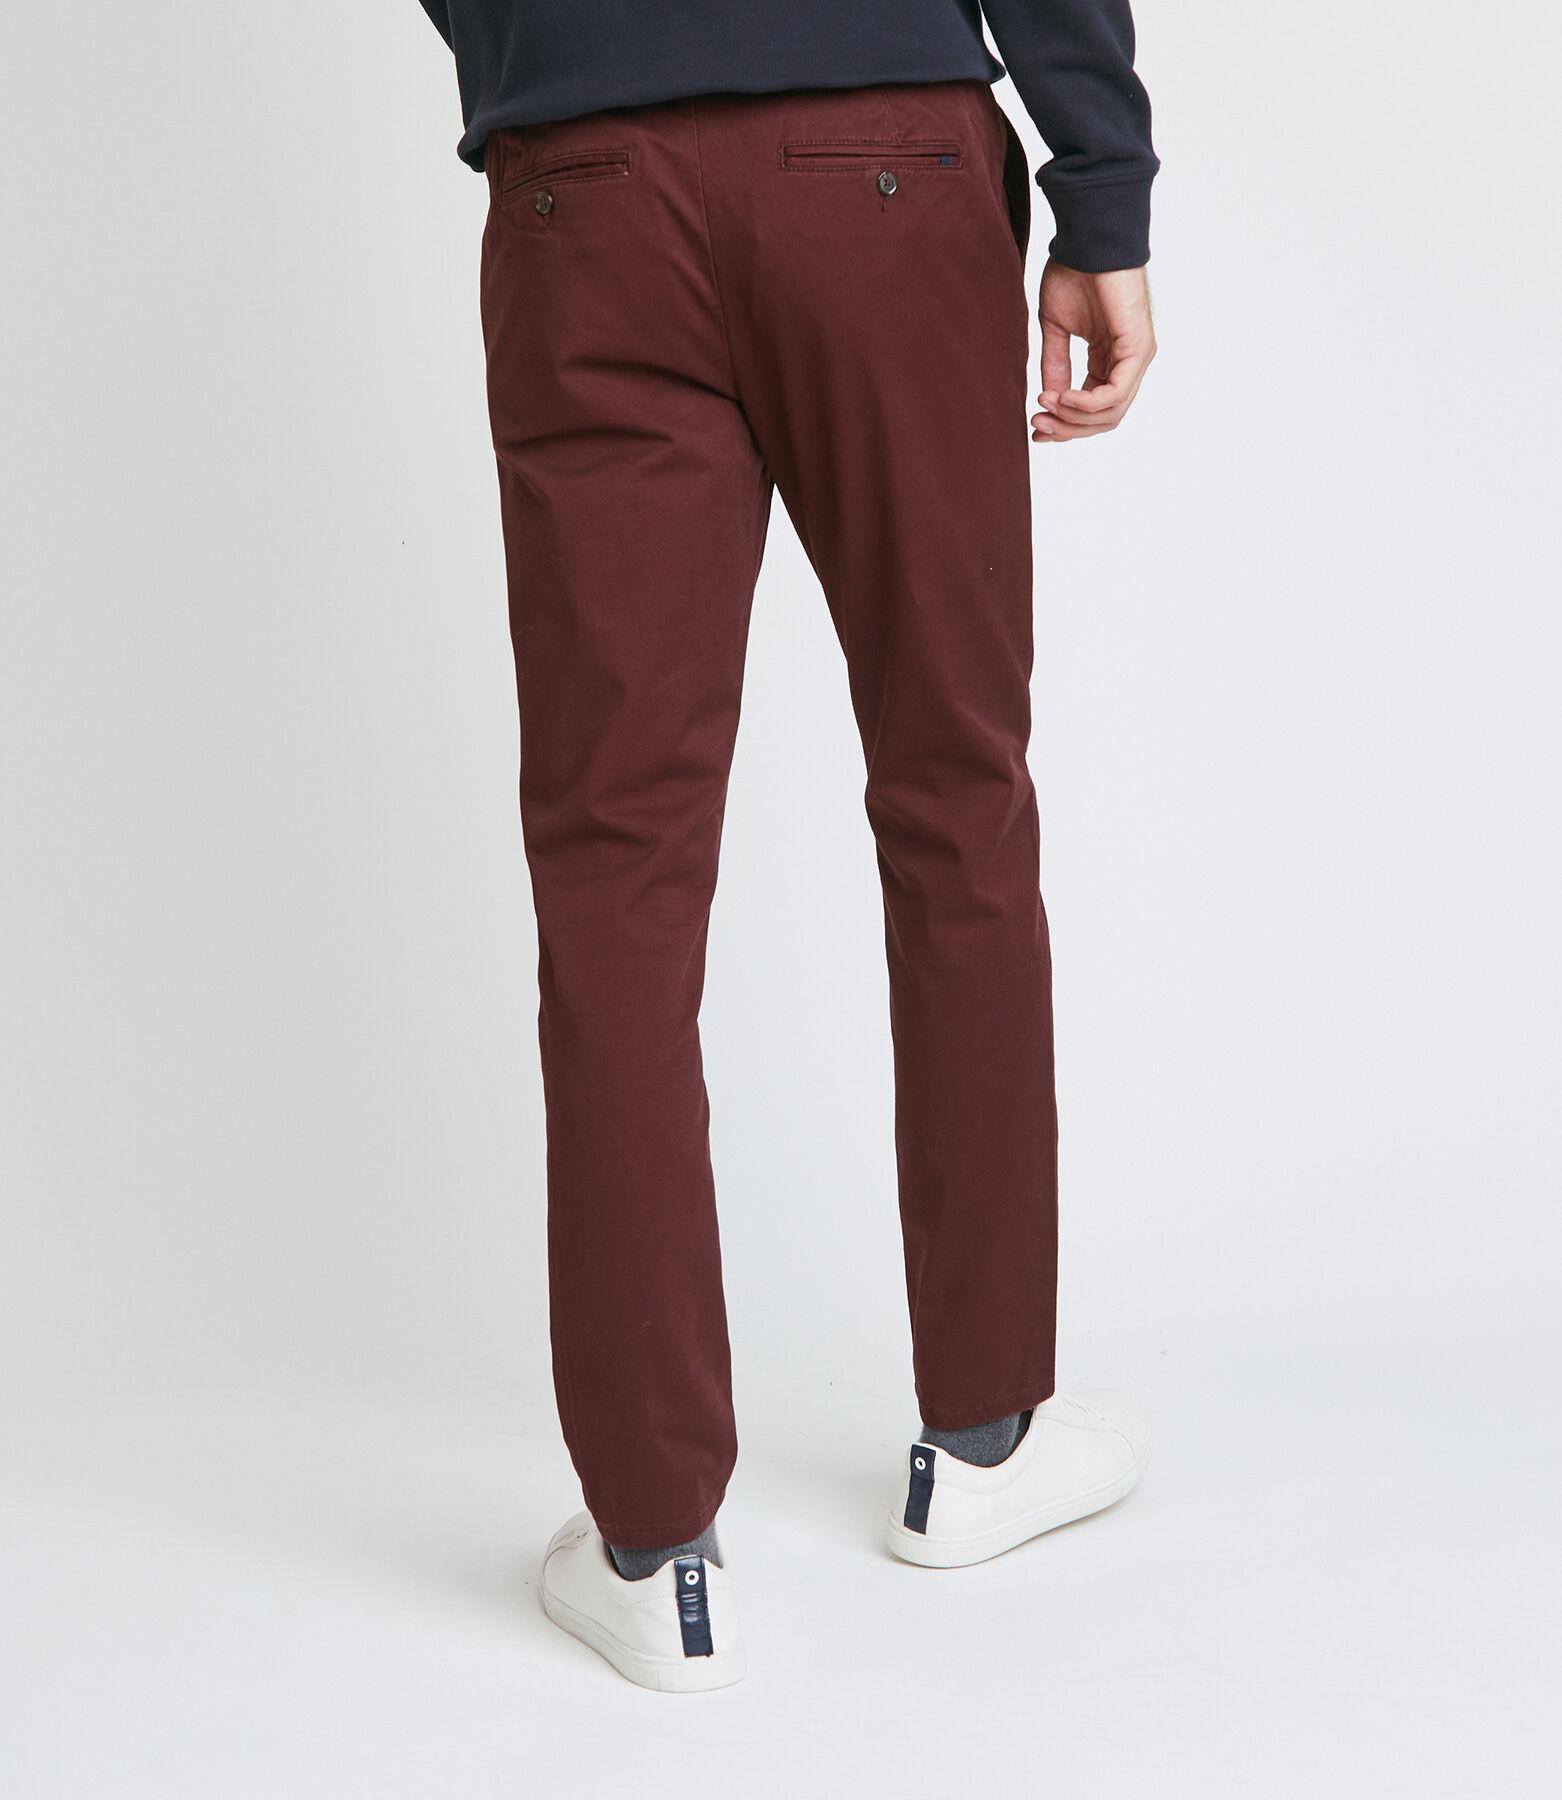 Pantalon chino ceinture elastiquée